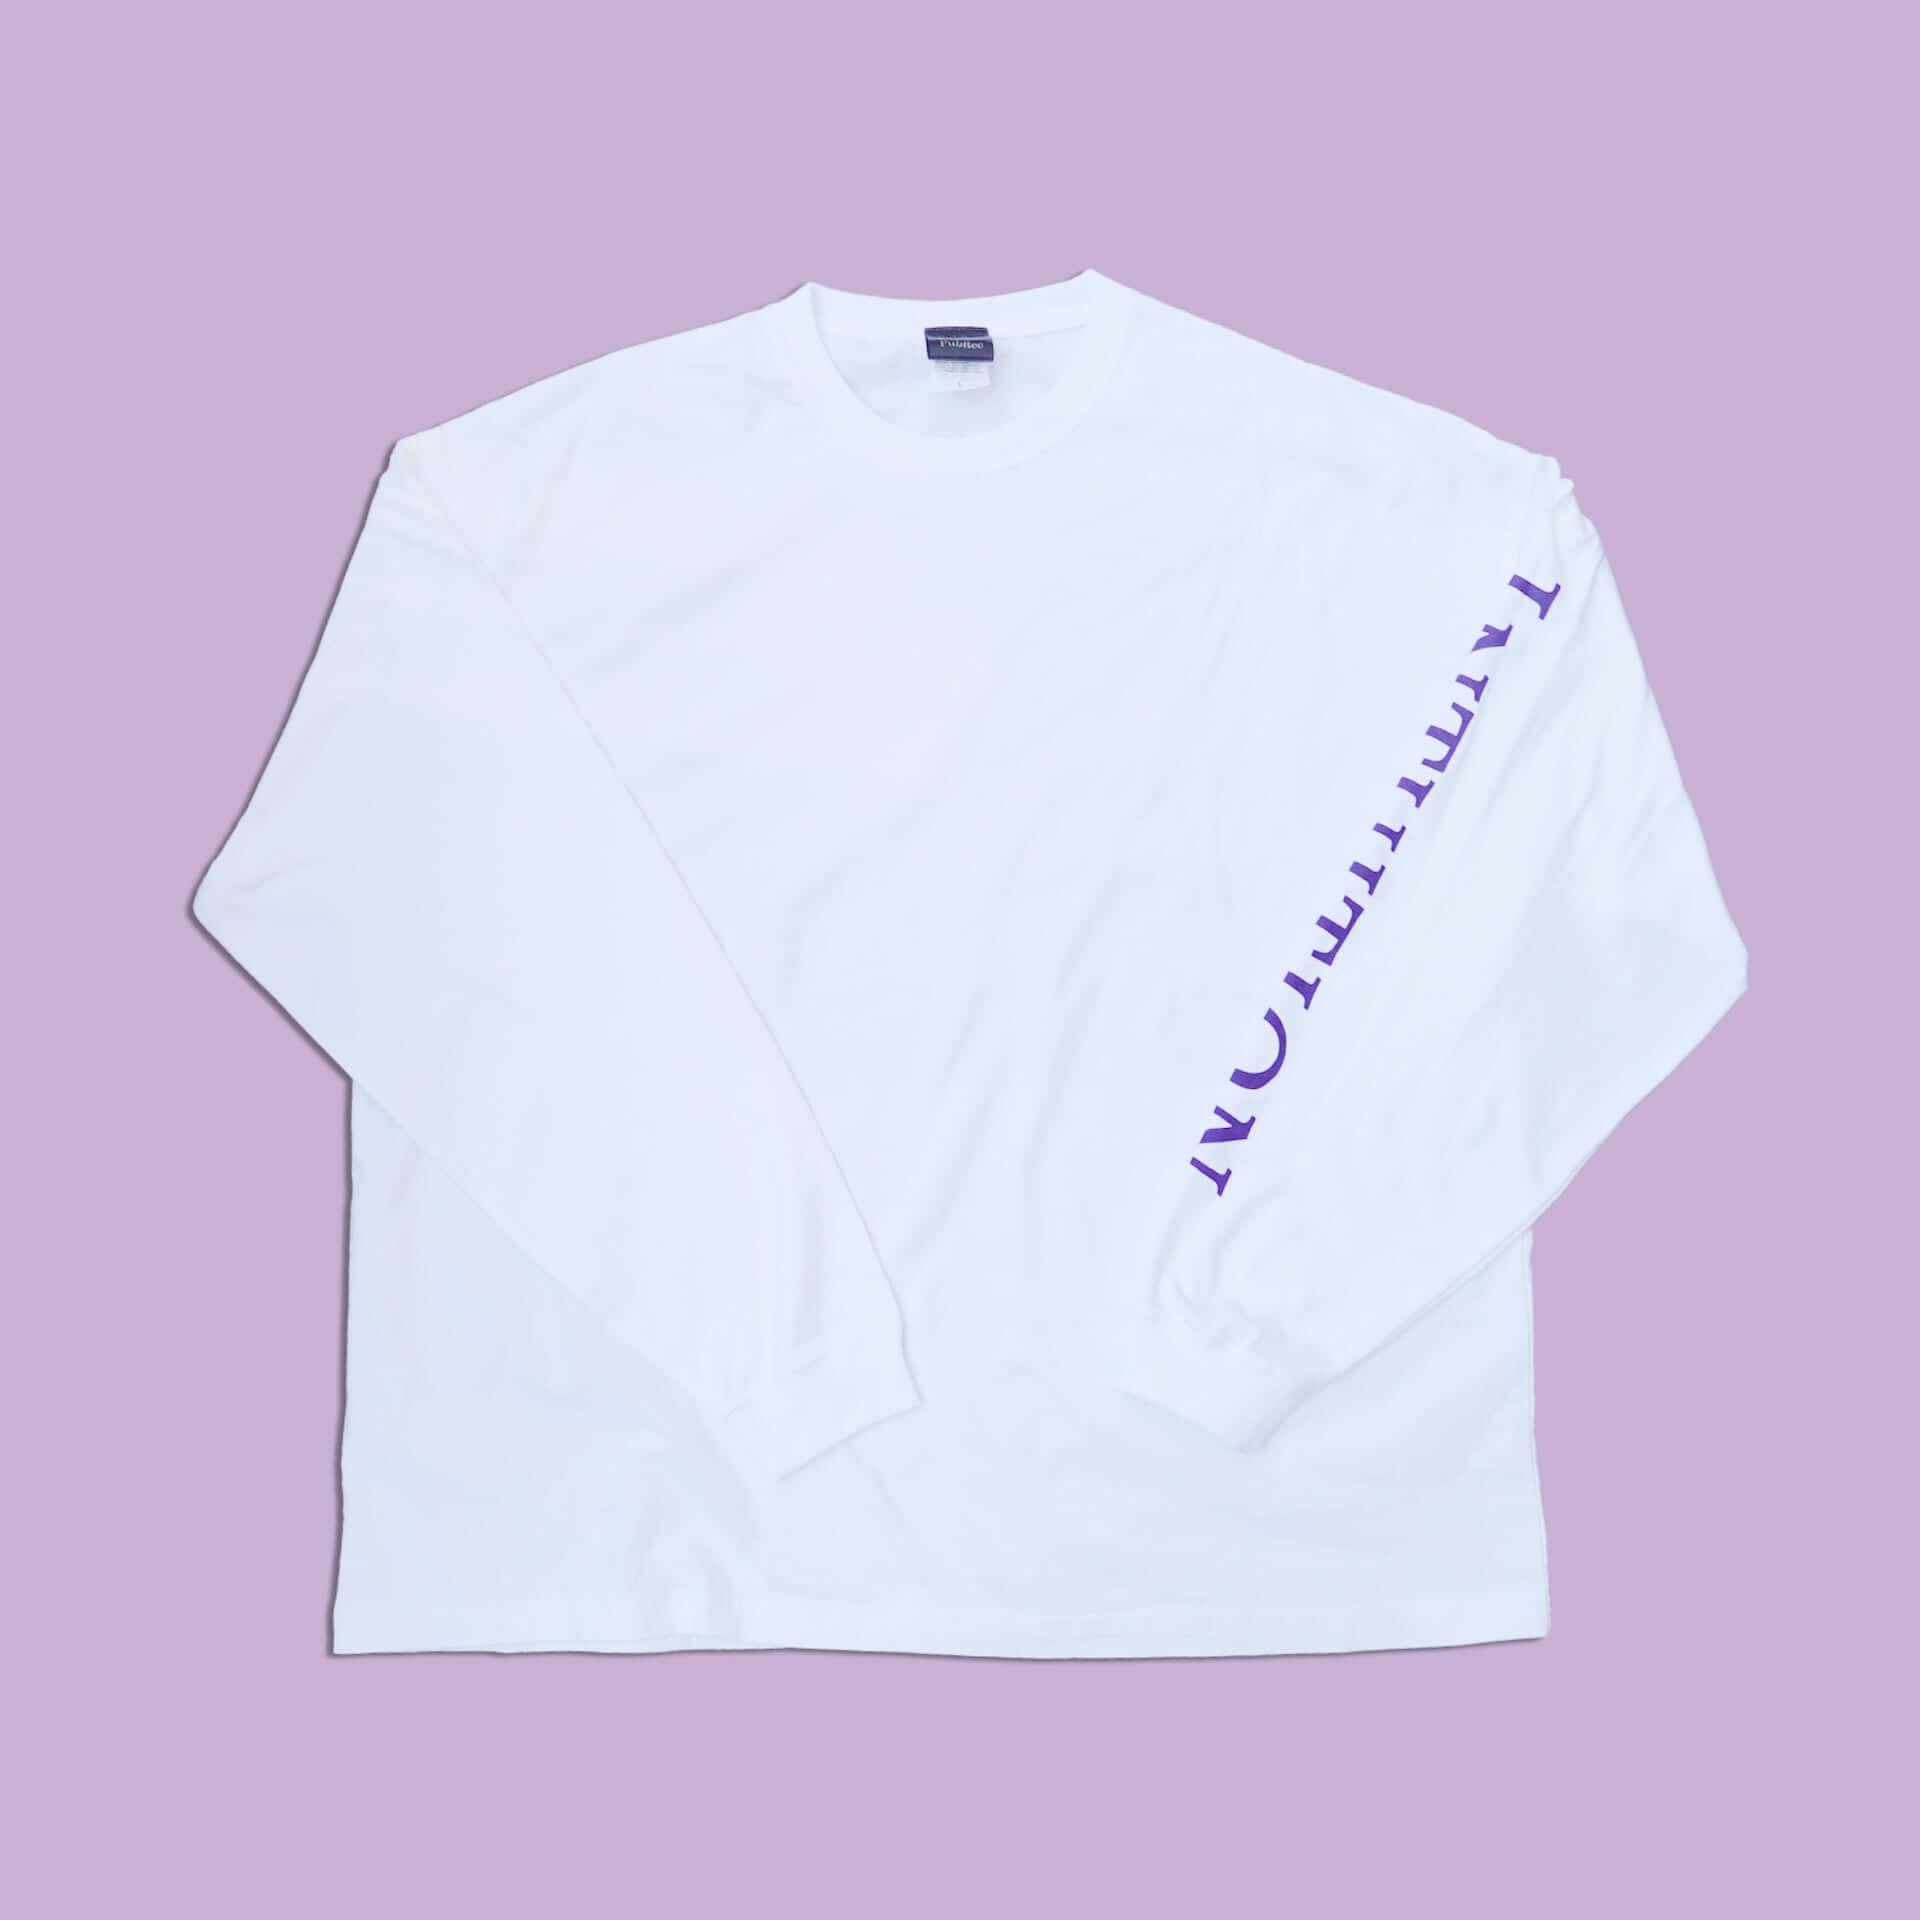 "erie&FKDの新曲""Intuition""がデジタルリリース!Shinji ItoUによるアートワークを施したTシャツも発売 music210225_erie_4-1920x1920"